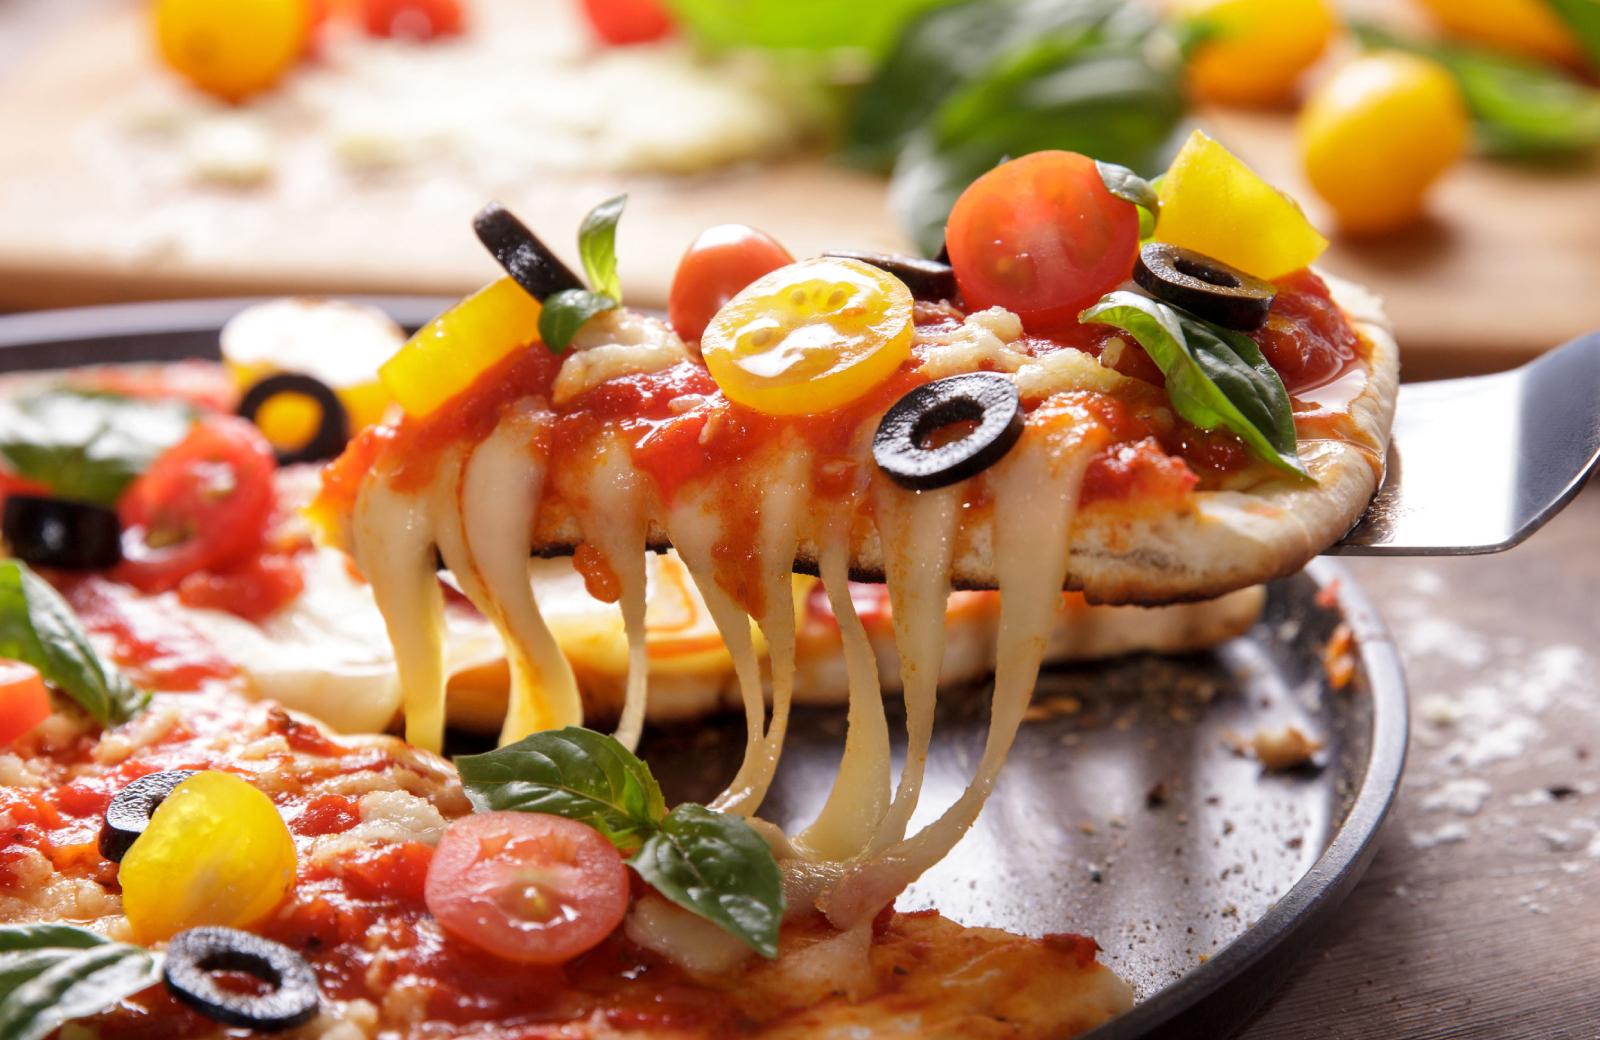 Norwalk Pizza - The Waypointe Apts